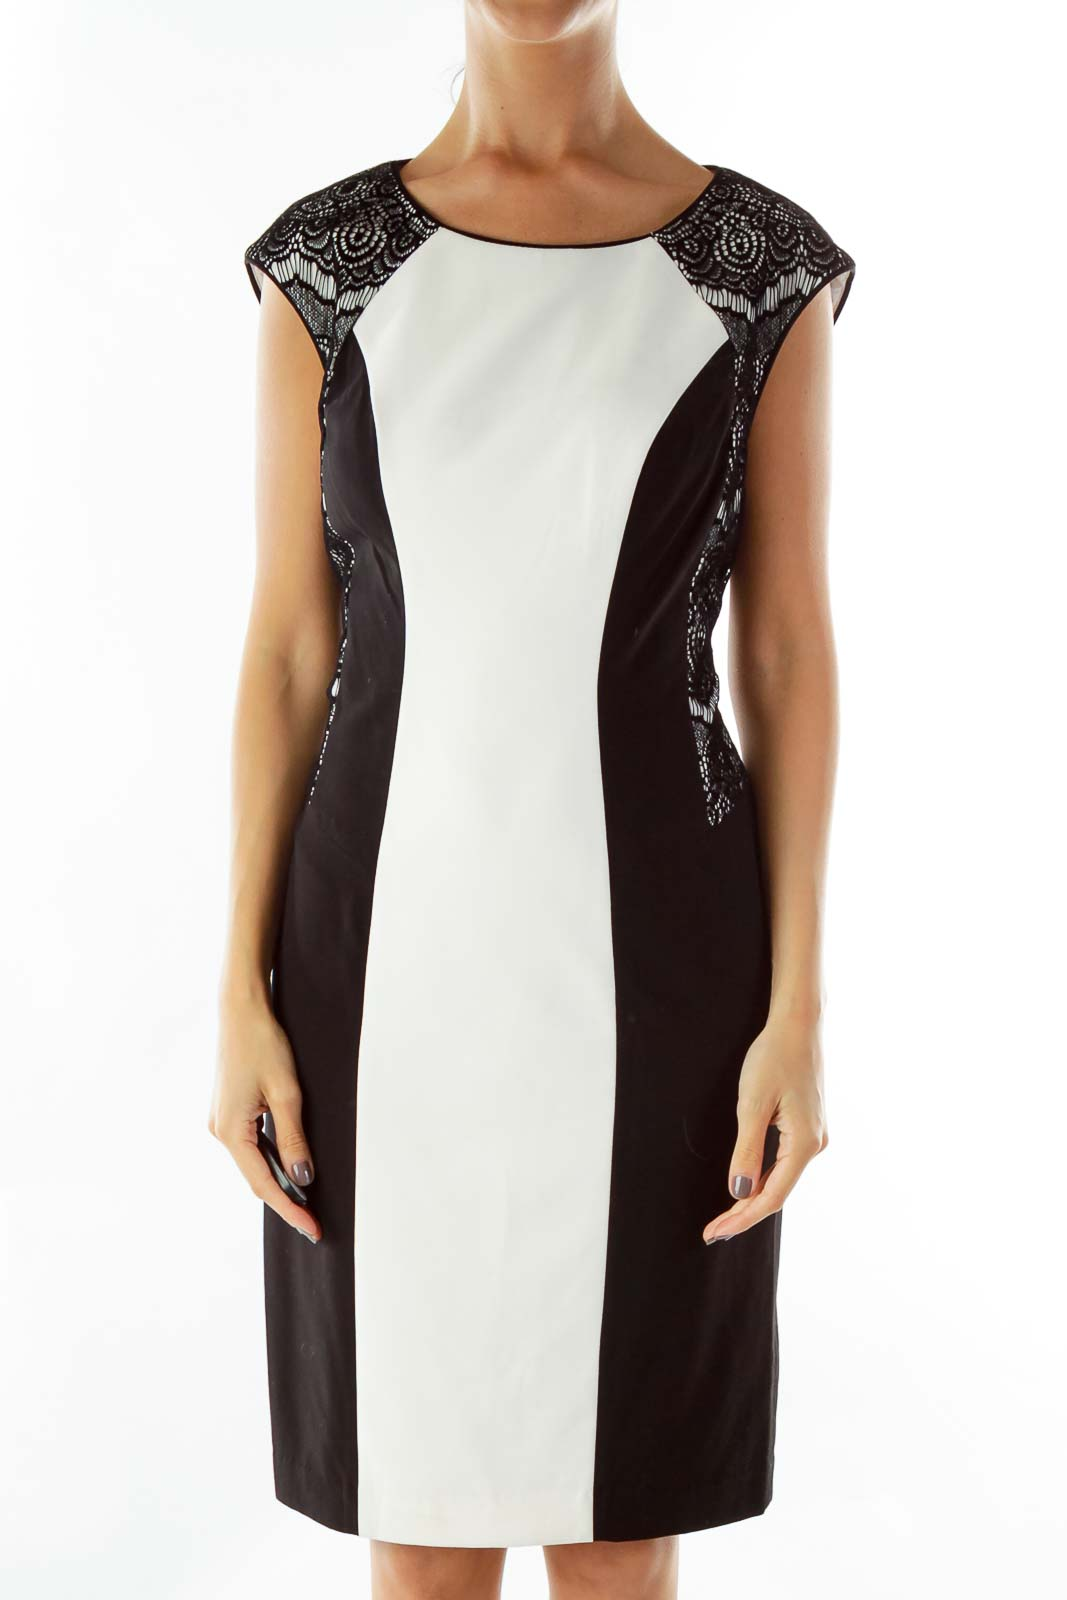 Black White Body Con Cocktail Dress Front